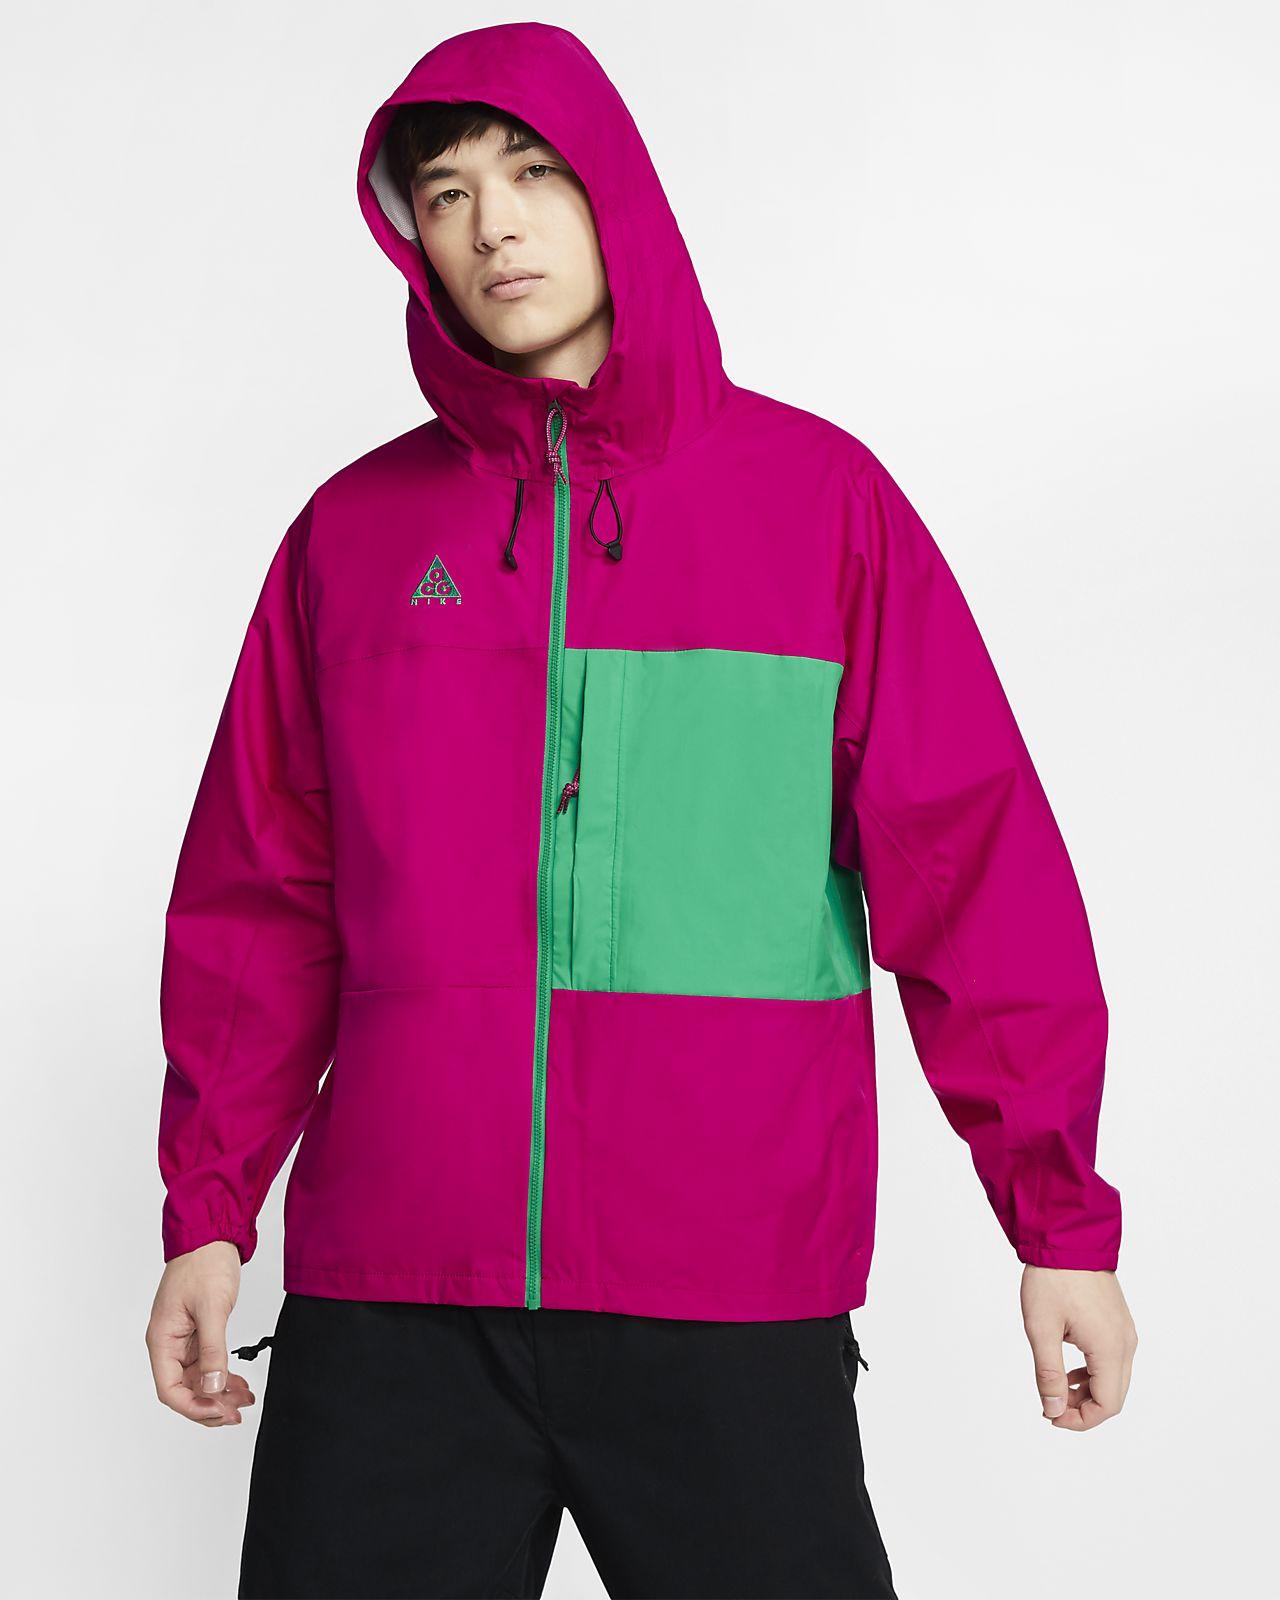 Skládací bunda Nike ACG do deště